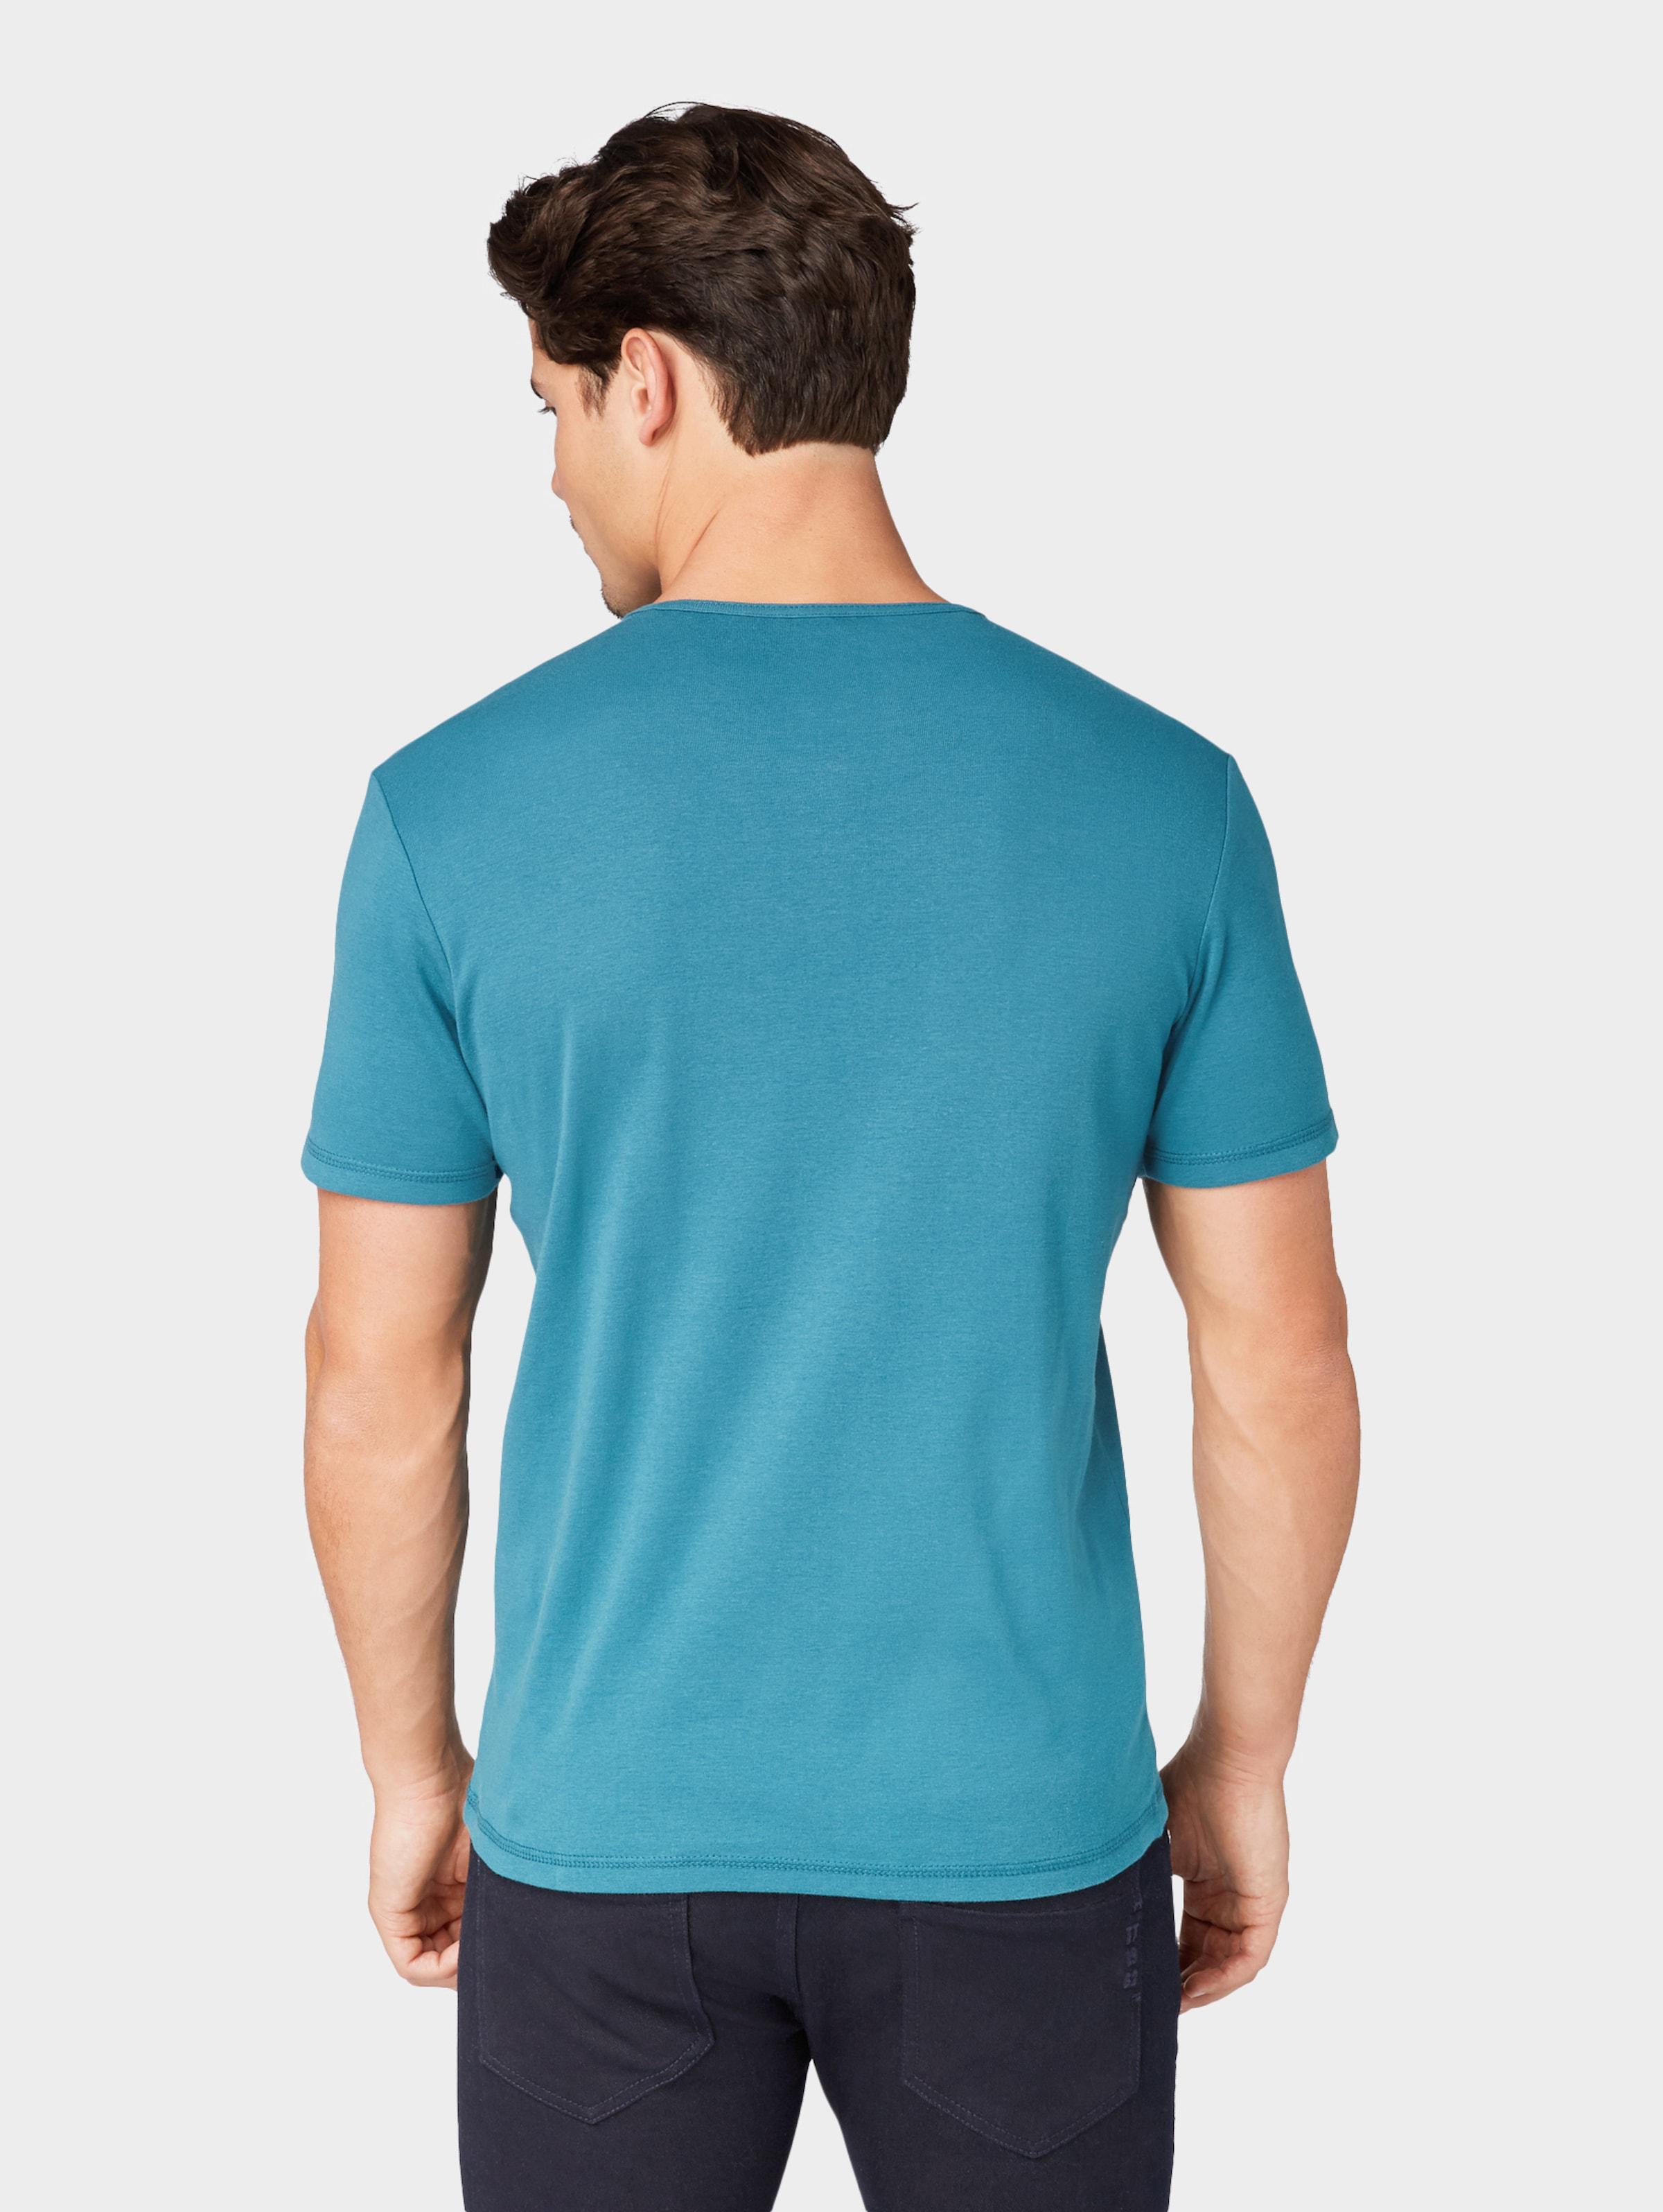 T Tailor shirt In Tom Pastellblau 8nyN0wvOm